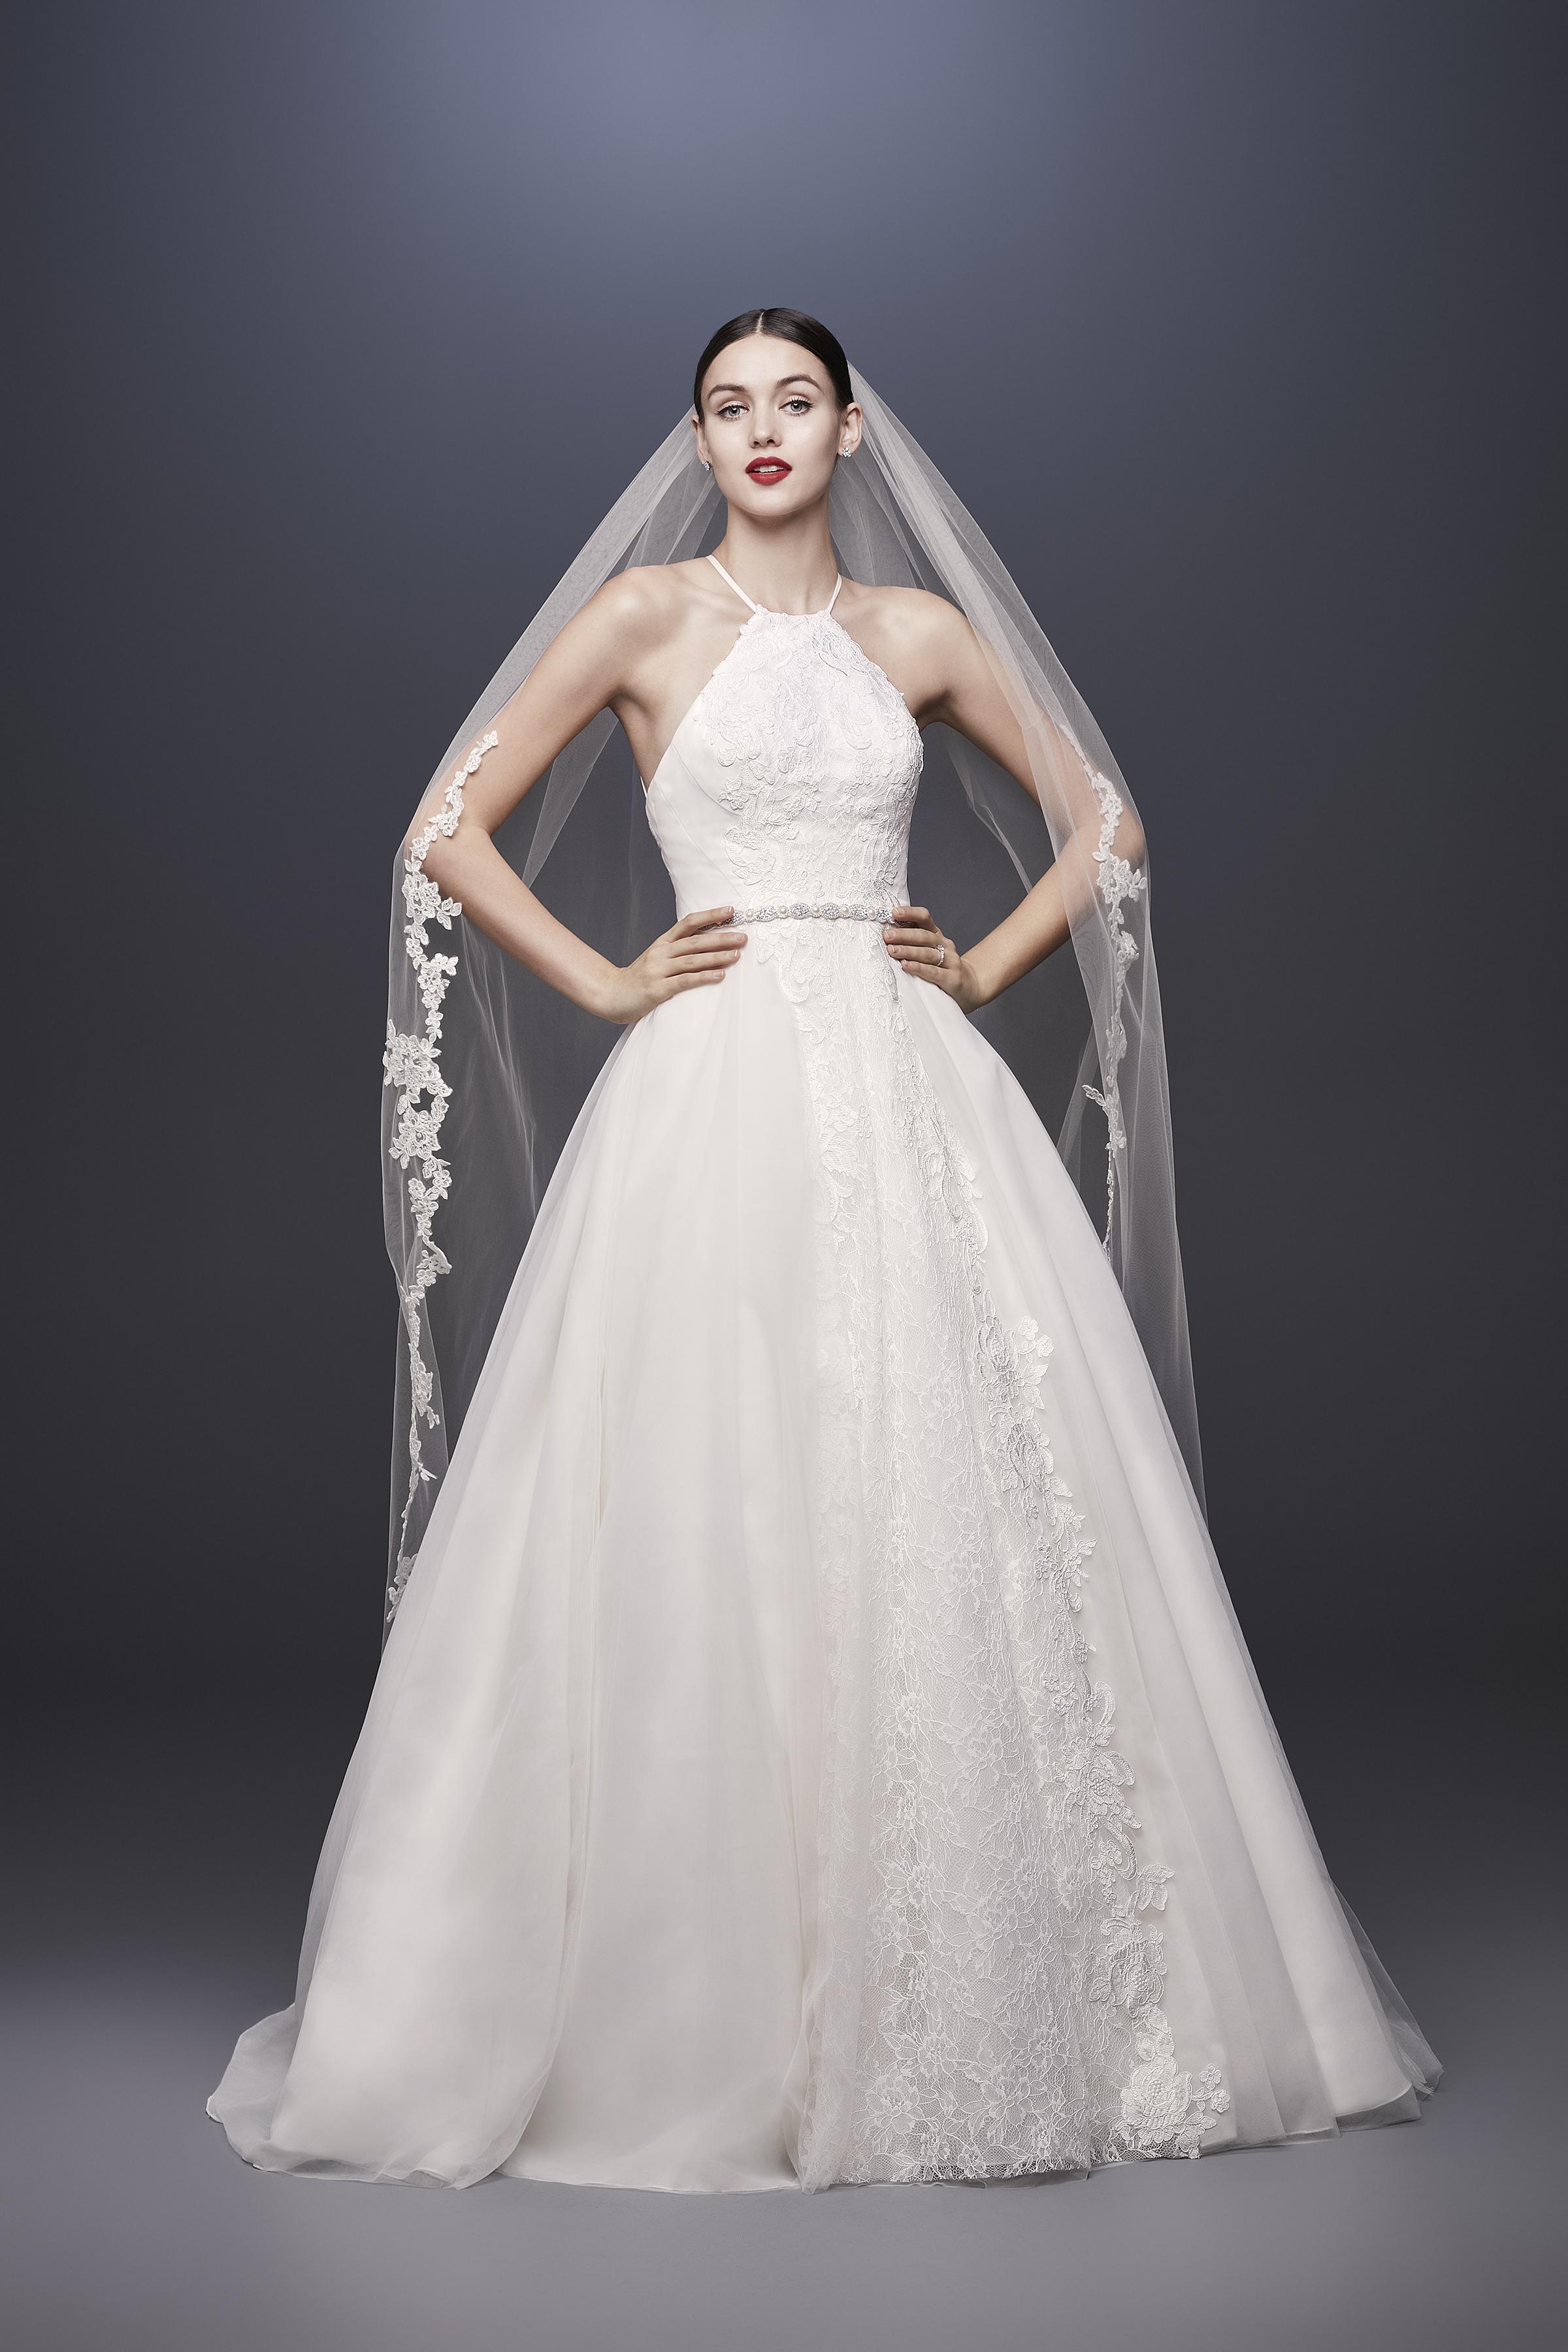 David's Bridal Truly Zac Posen Collection Spring 2018